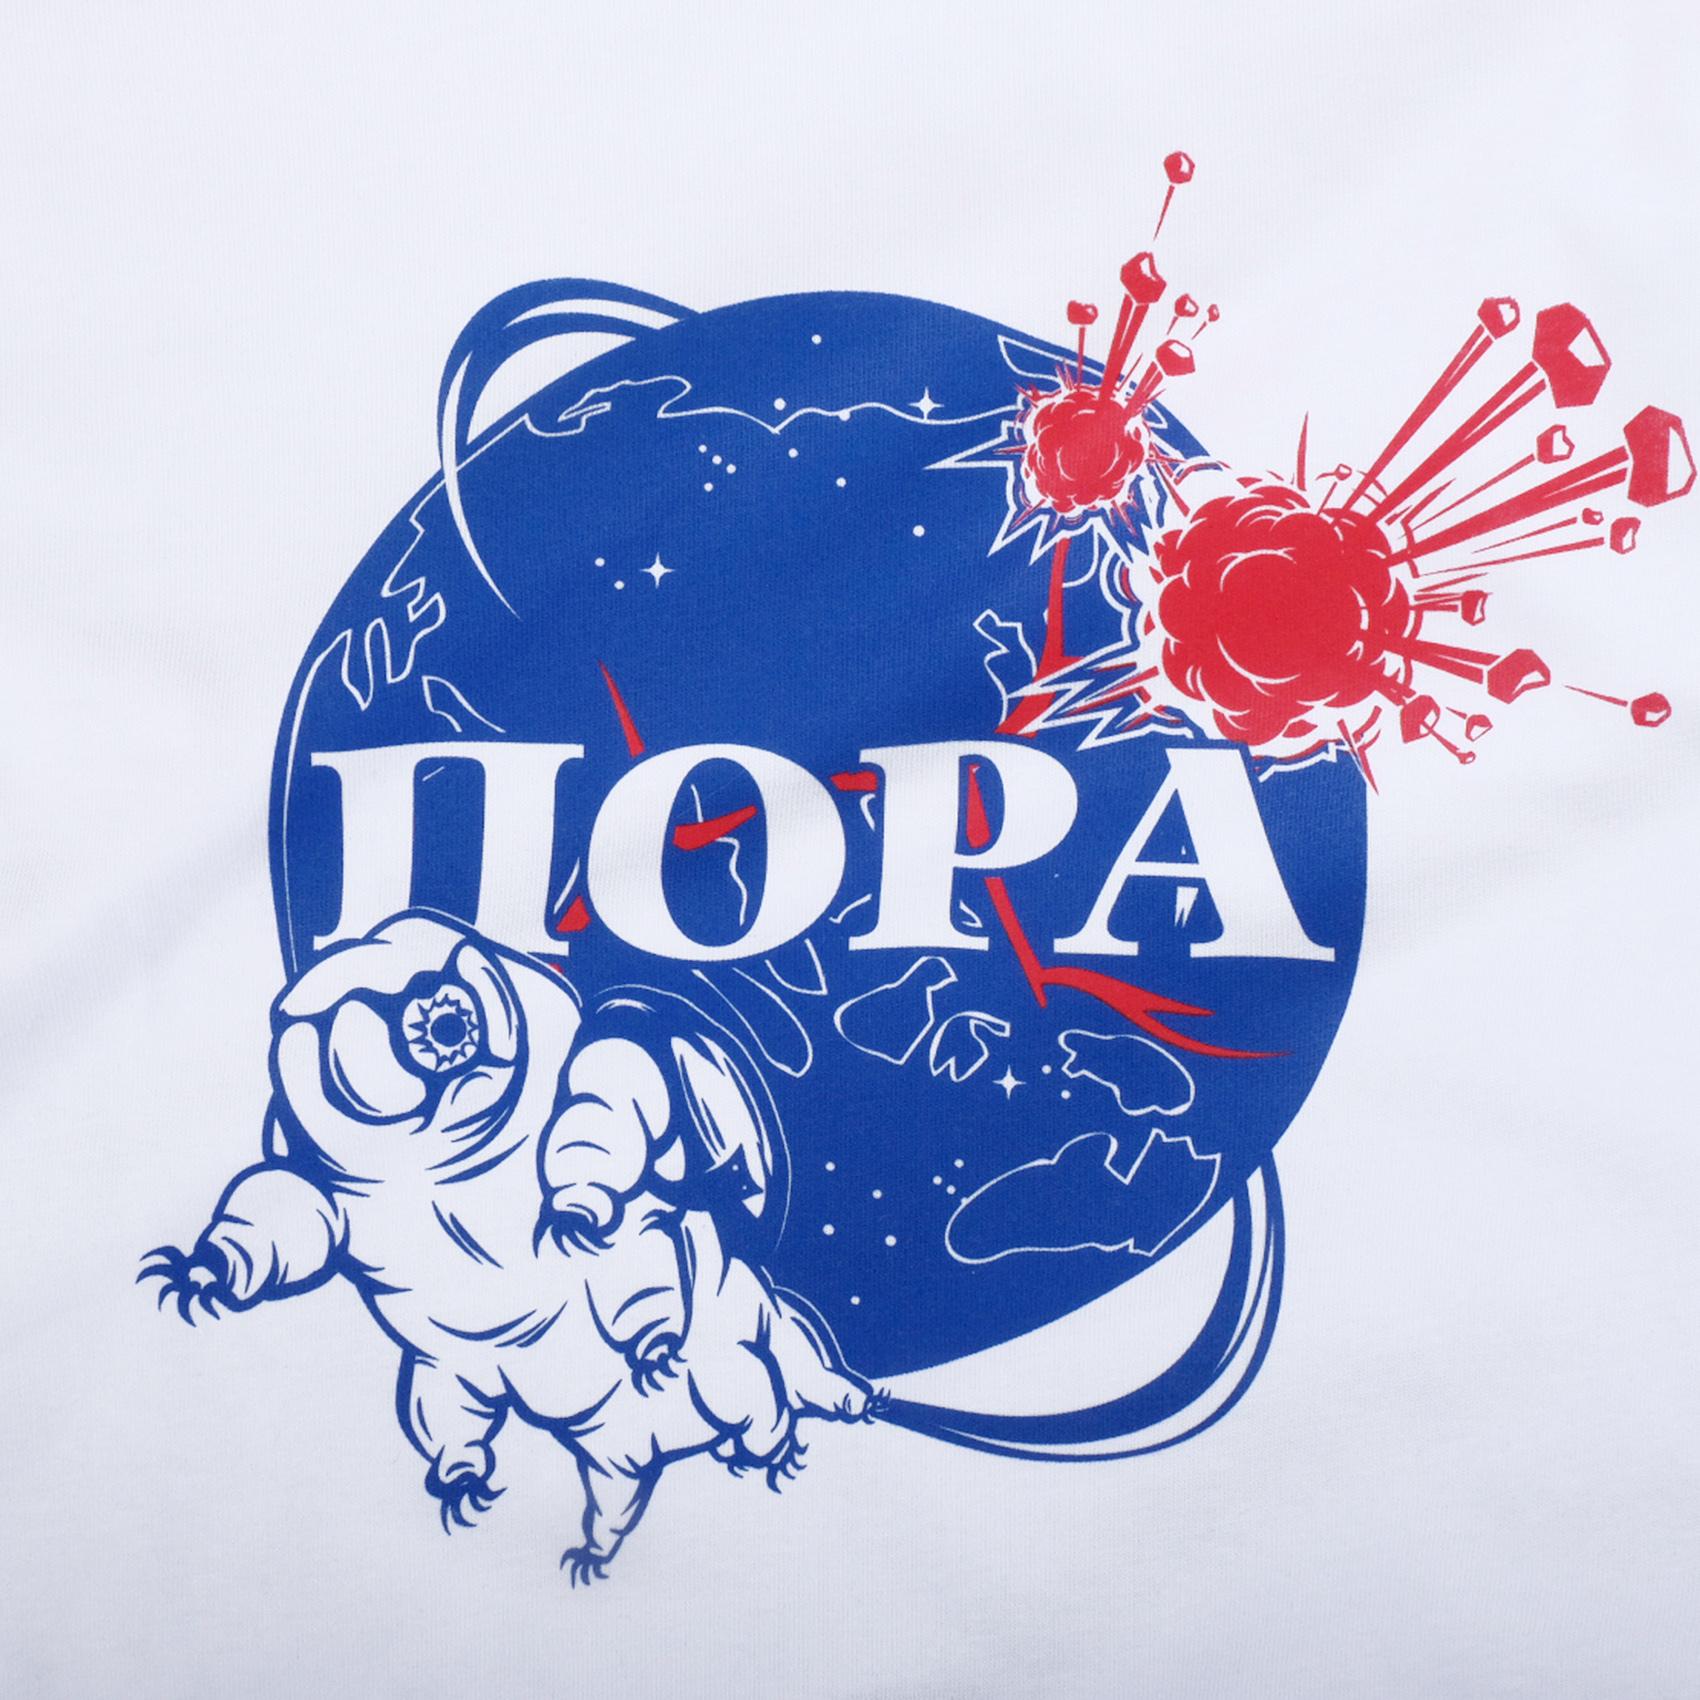 Пора - Тихоходка Пётр / футболка